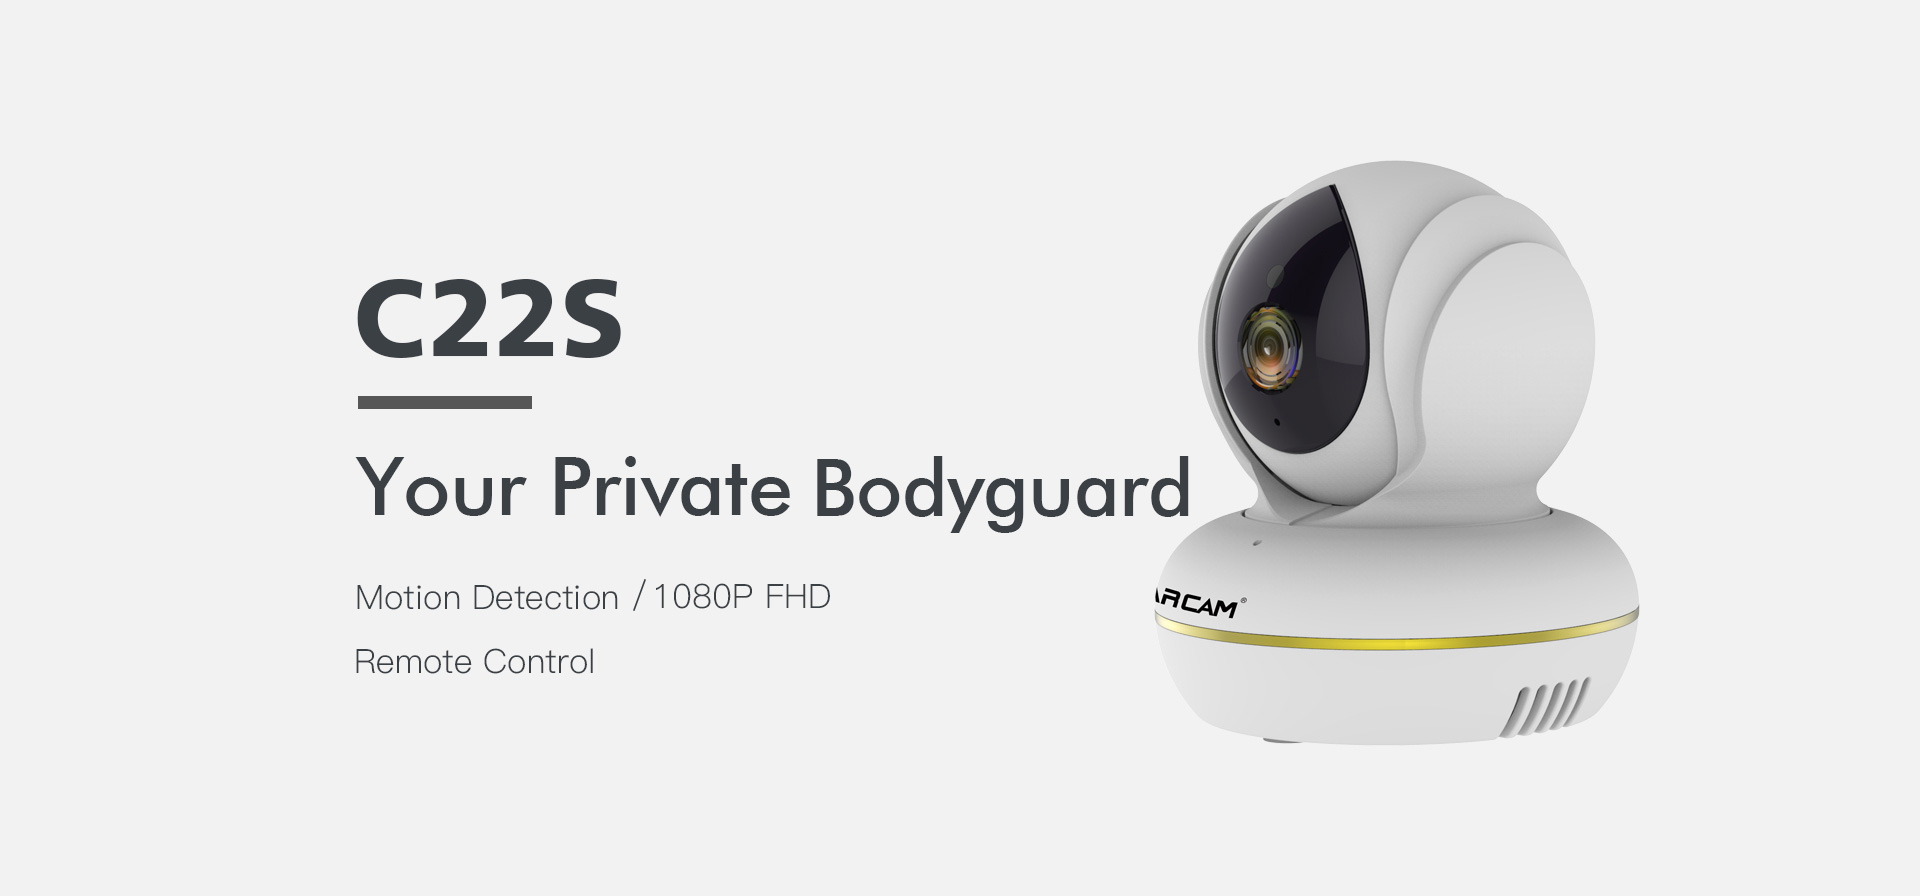 network-camera-c22s